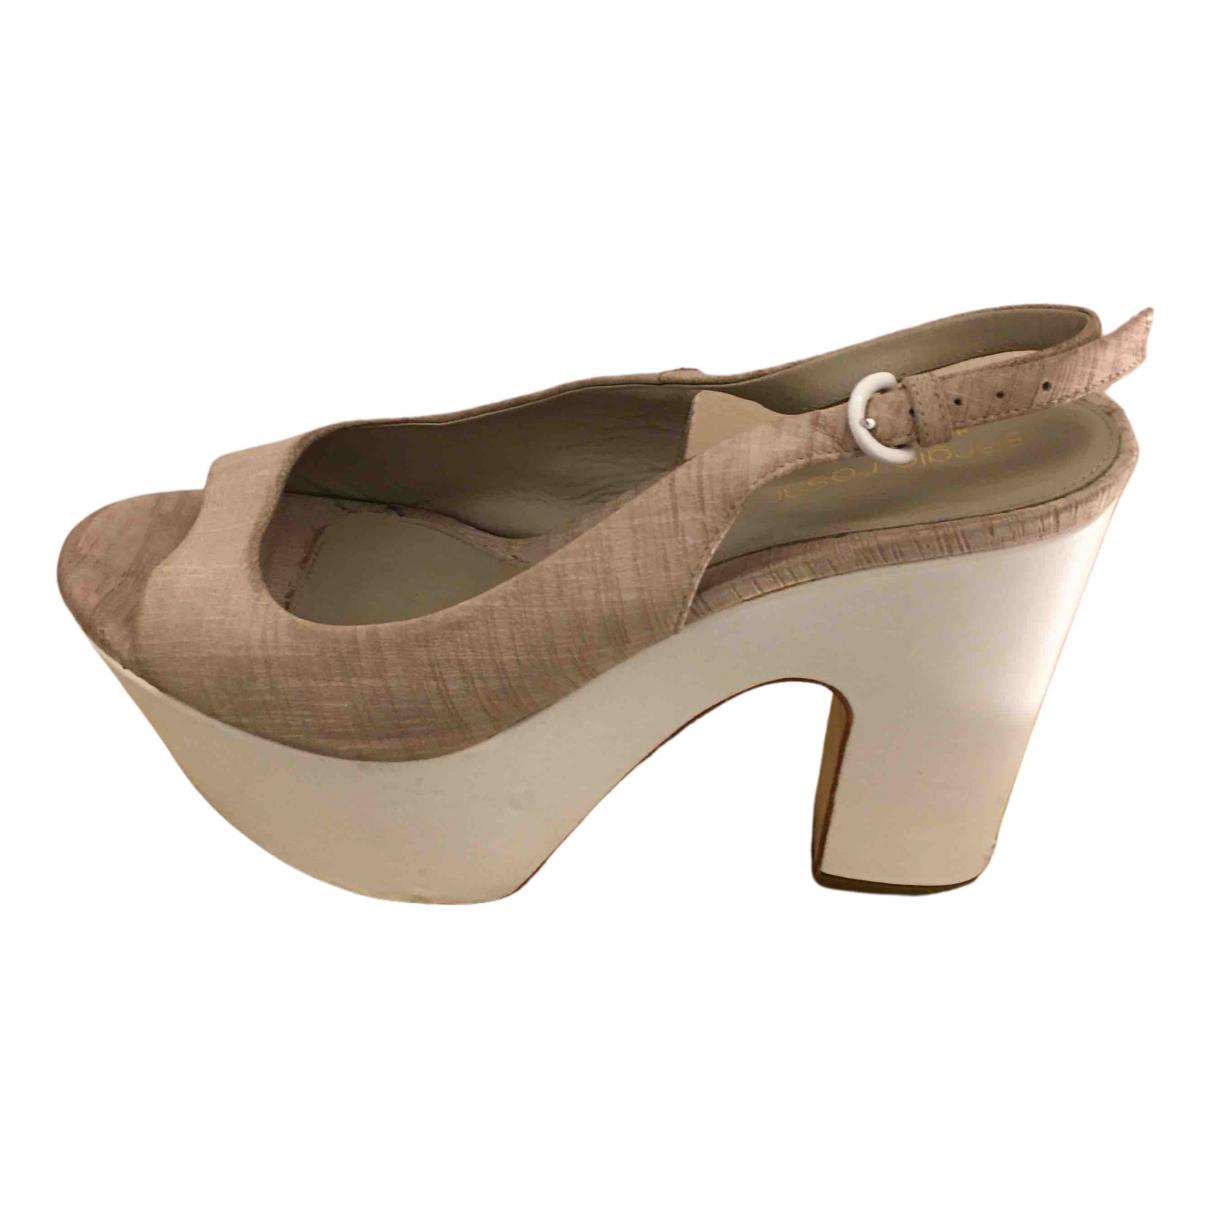 Sergio Rossi N Beige Cloth Sandals for Women 37 EU